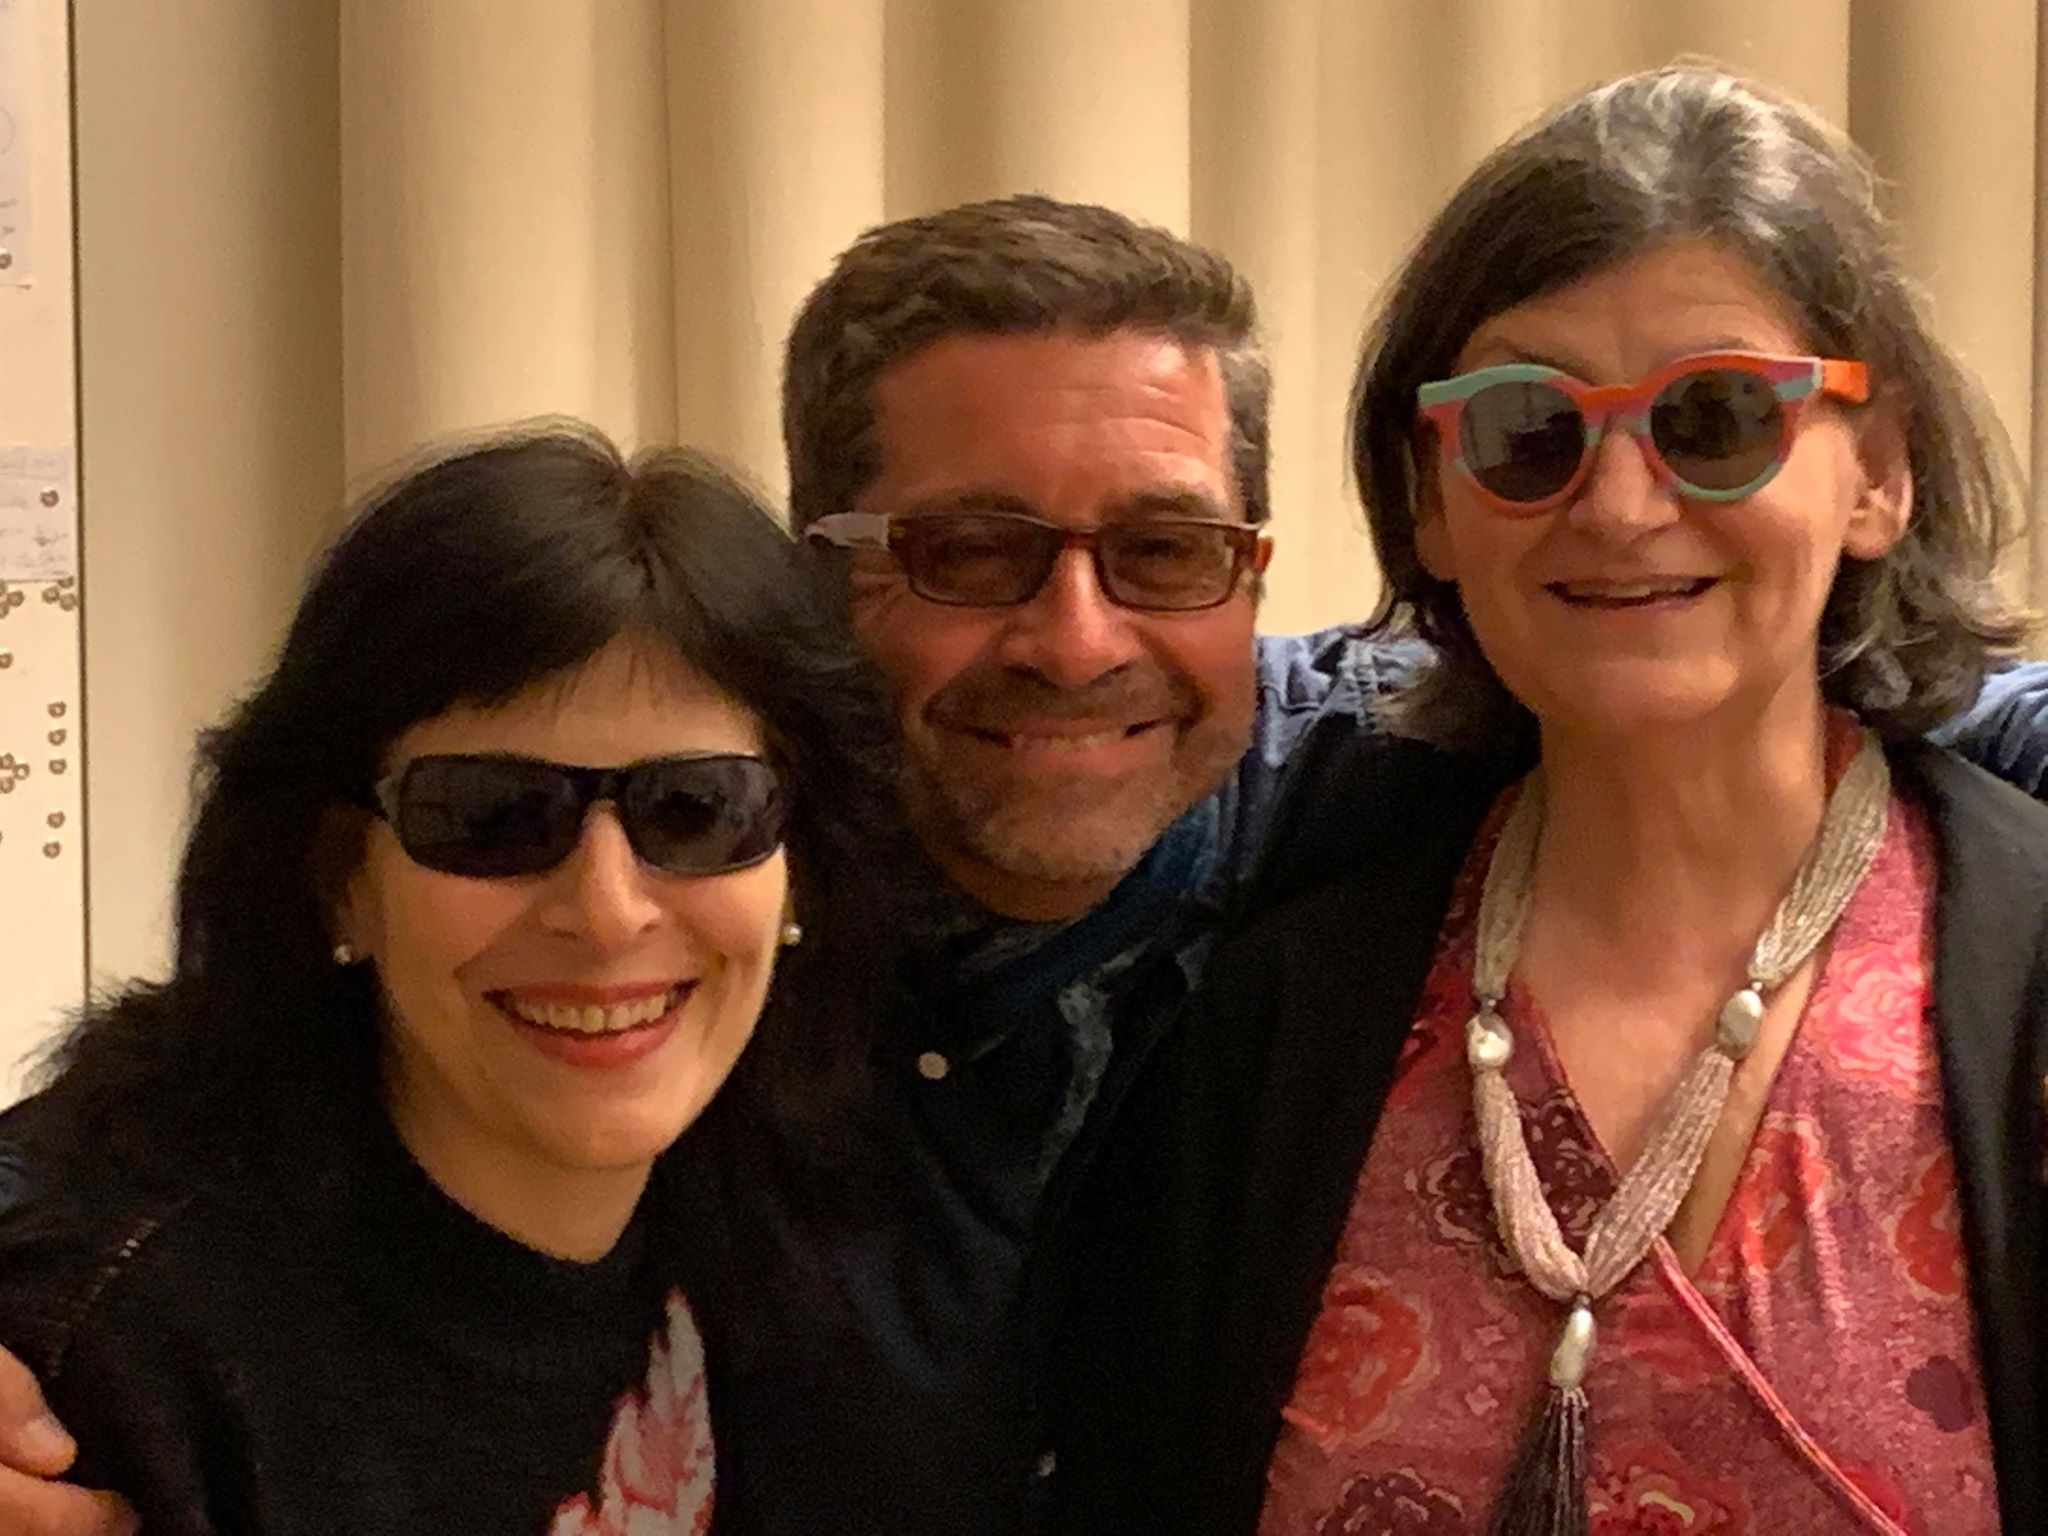 2019 Toâ et Moâ Trio 06 best.jpg